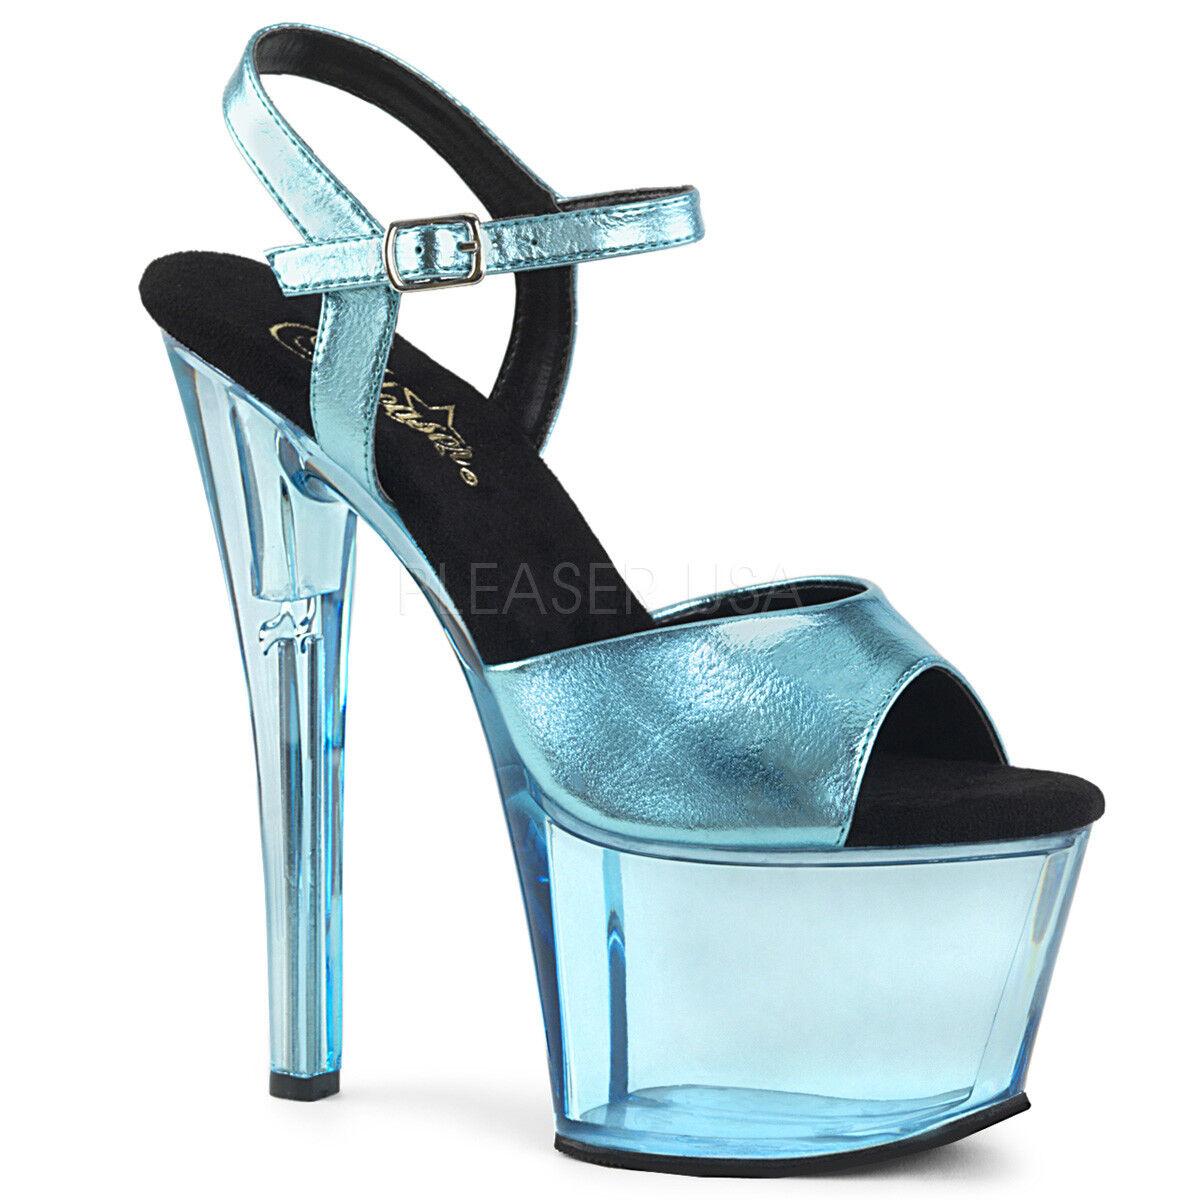 garanzia di credito Pleaser SKY-309MT Donna  Baby blu Metallic Metallic Metallic PU Tinted Heels Ankle Strap Sandals  memorizzare